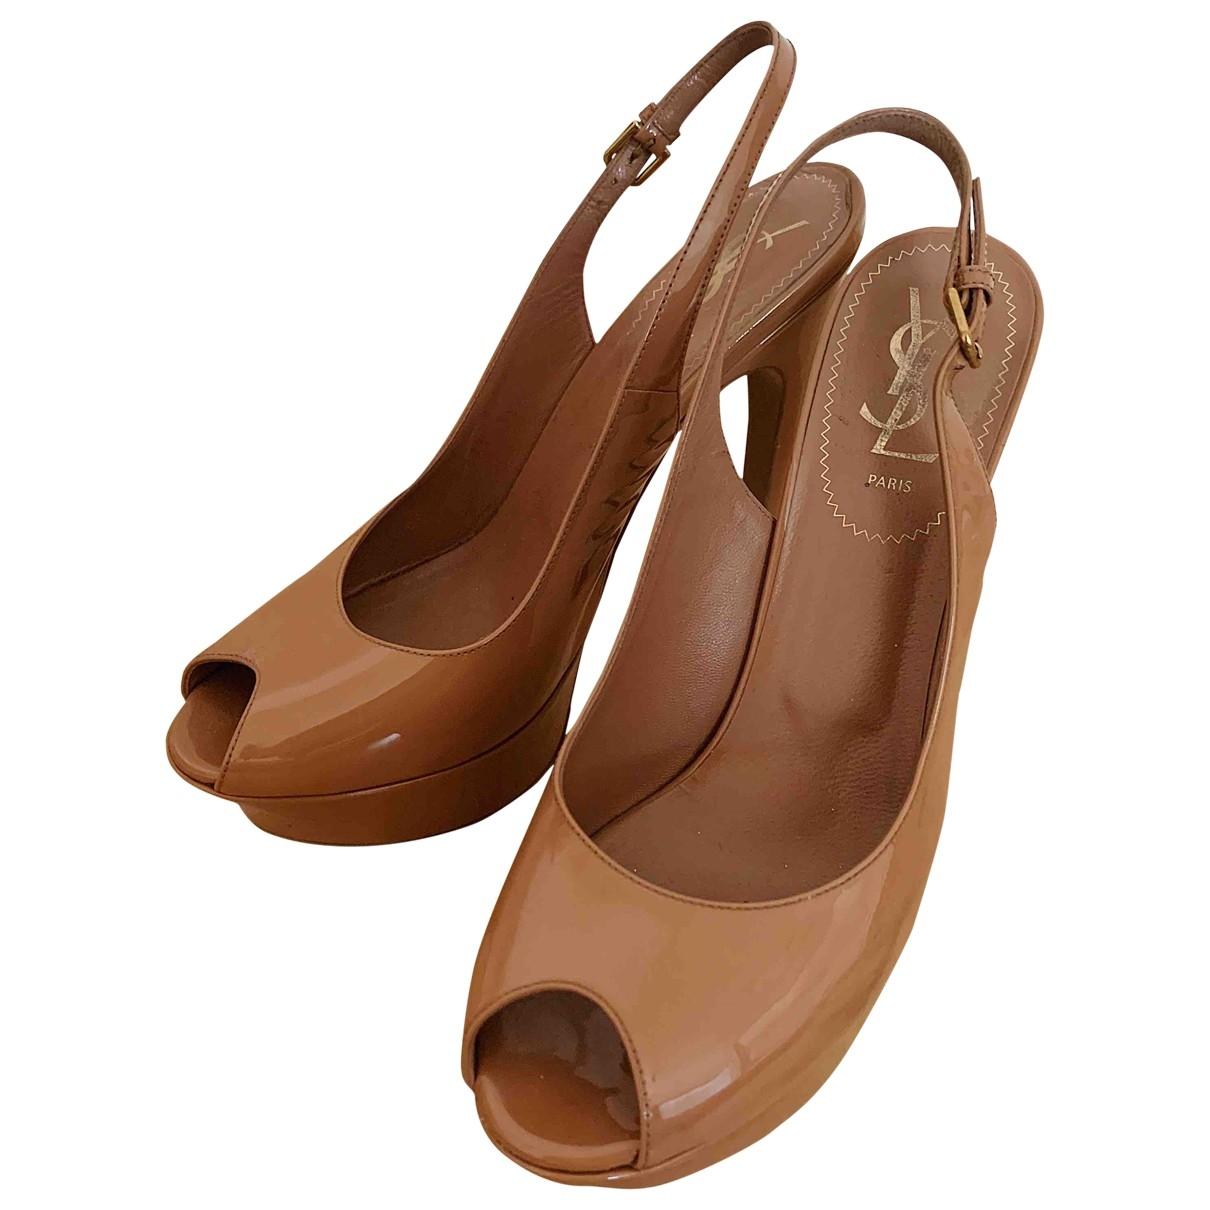 Yves Saint Laurent \N Beige Patent leather Heels for Women 39 EU